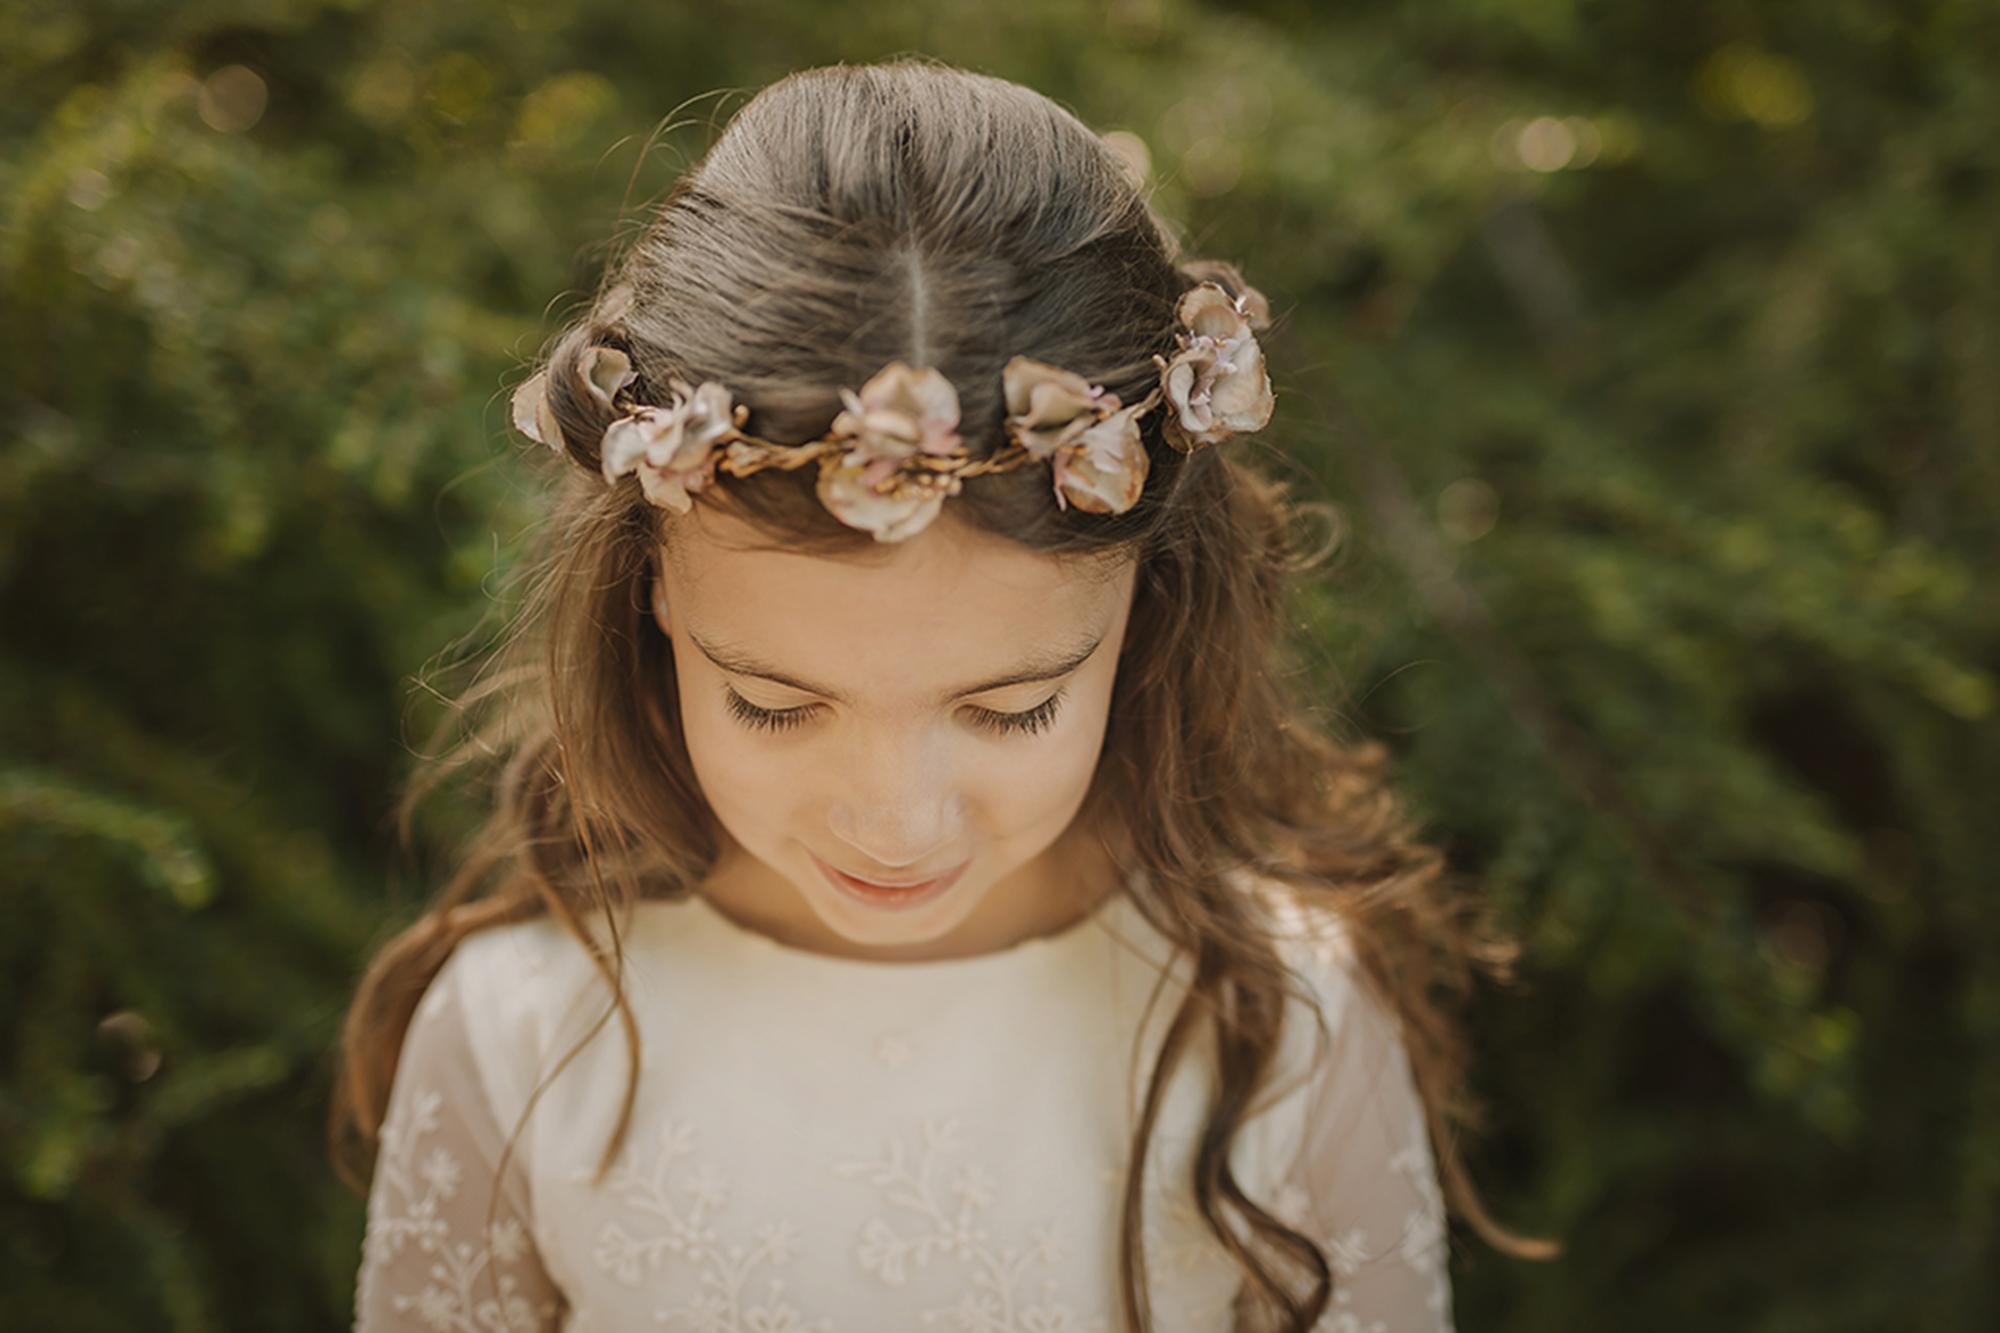 familia, fotos de familia en estudio,fotos de familia en exterior, el día de la madre, el día del padre, bodas, bodas Zaragoza,